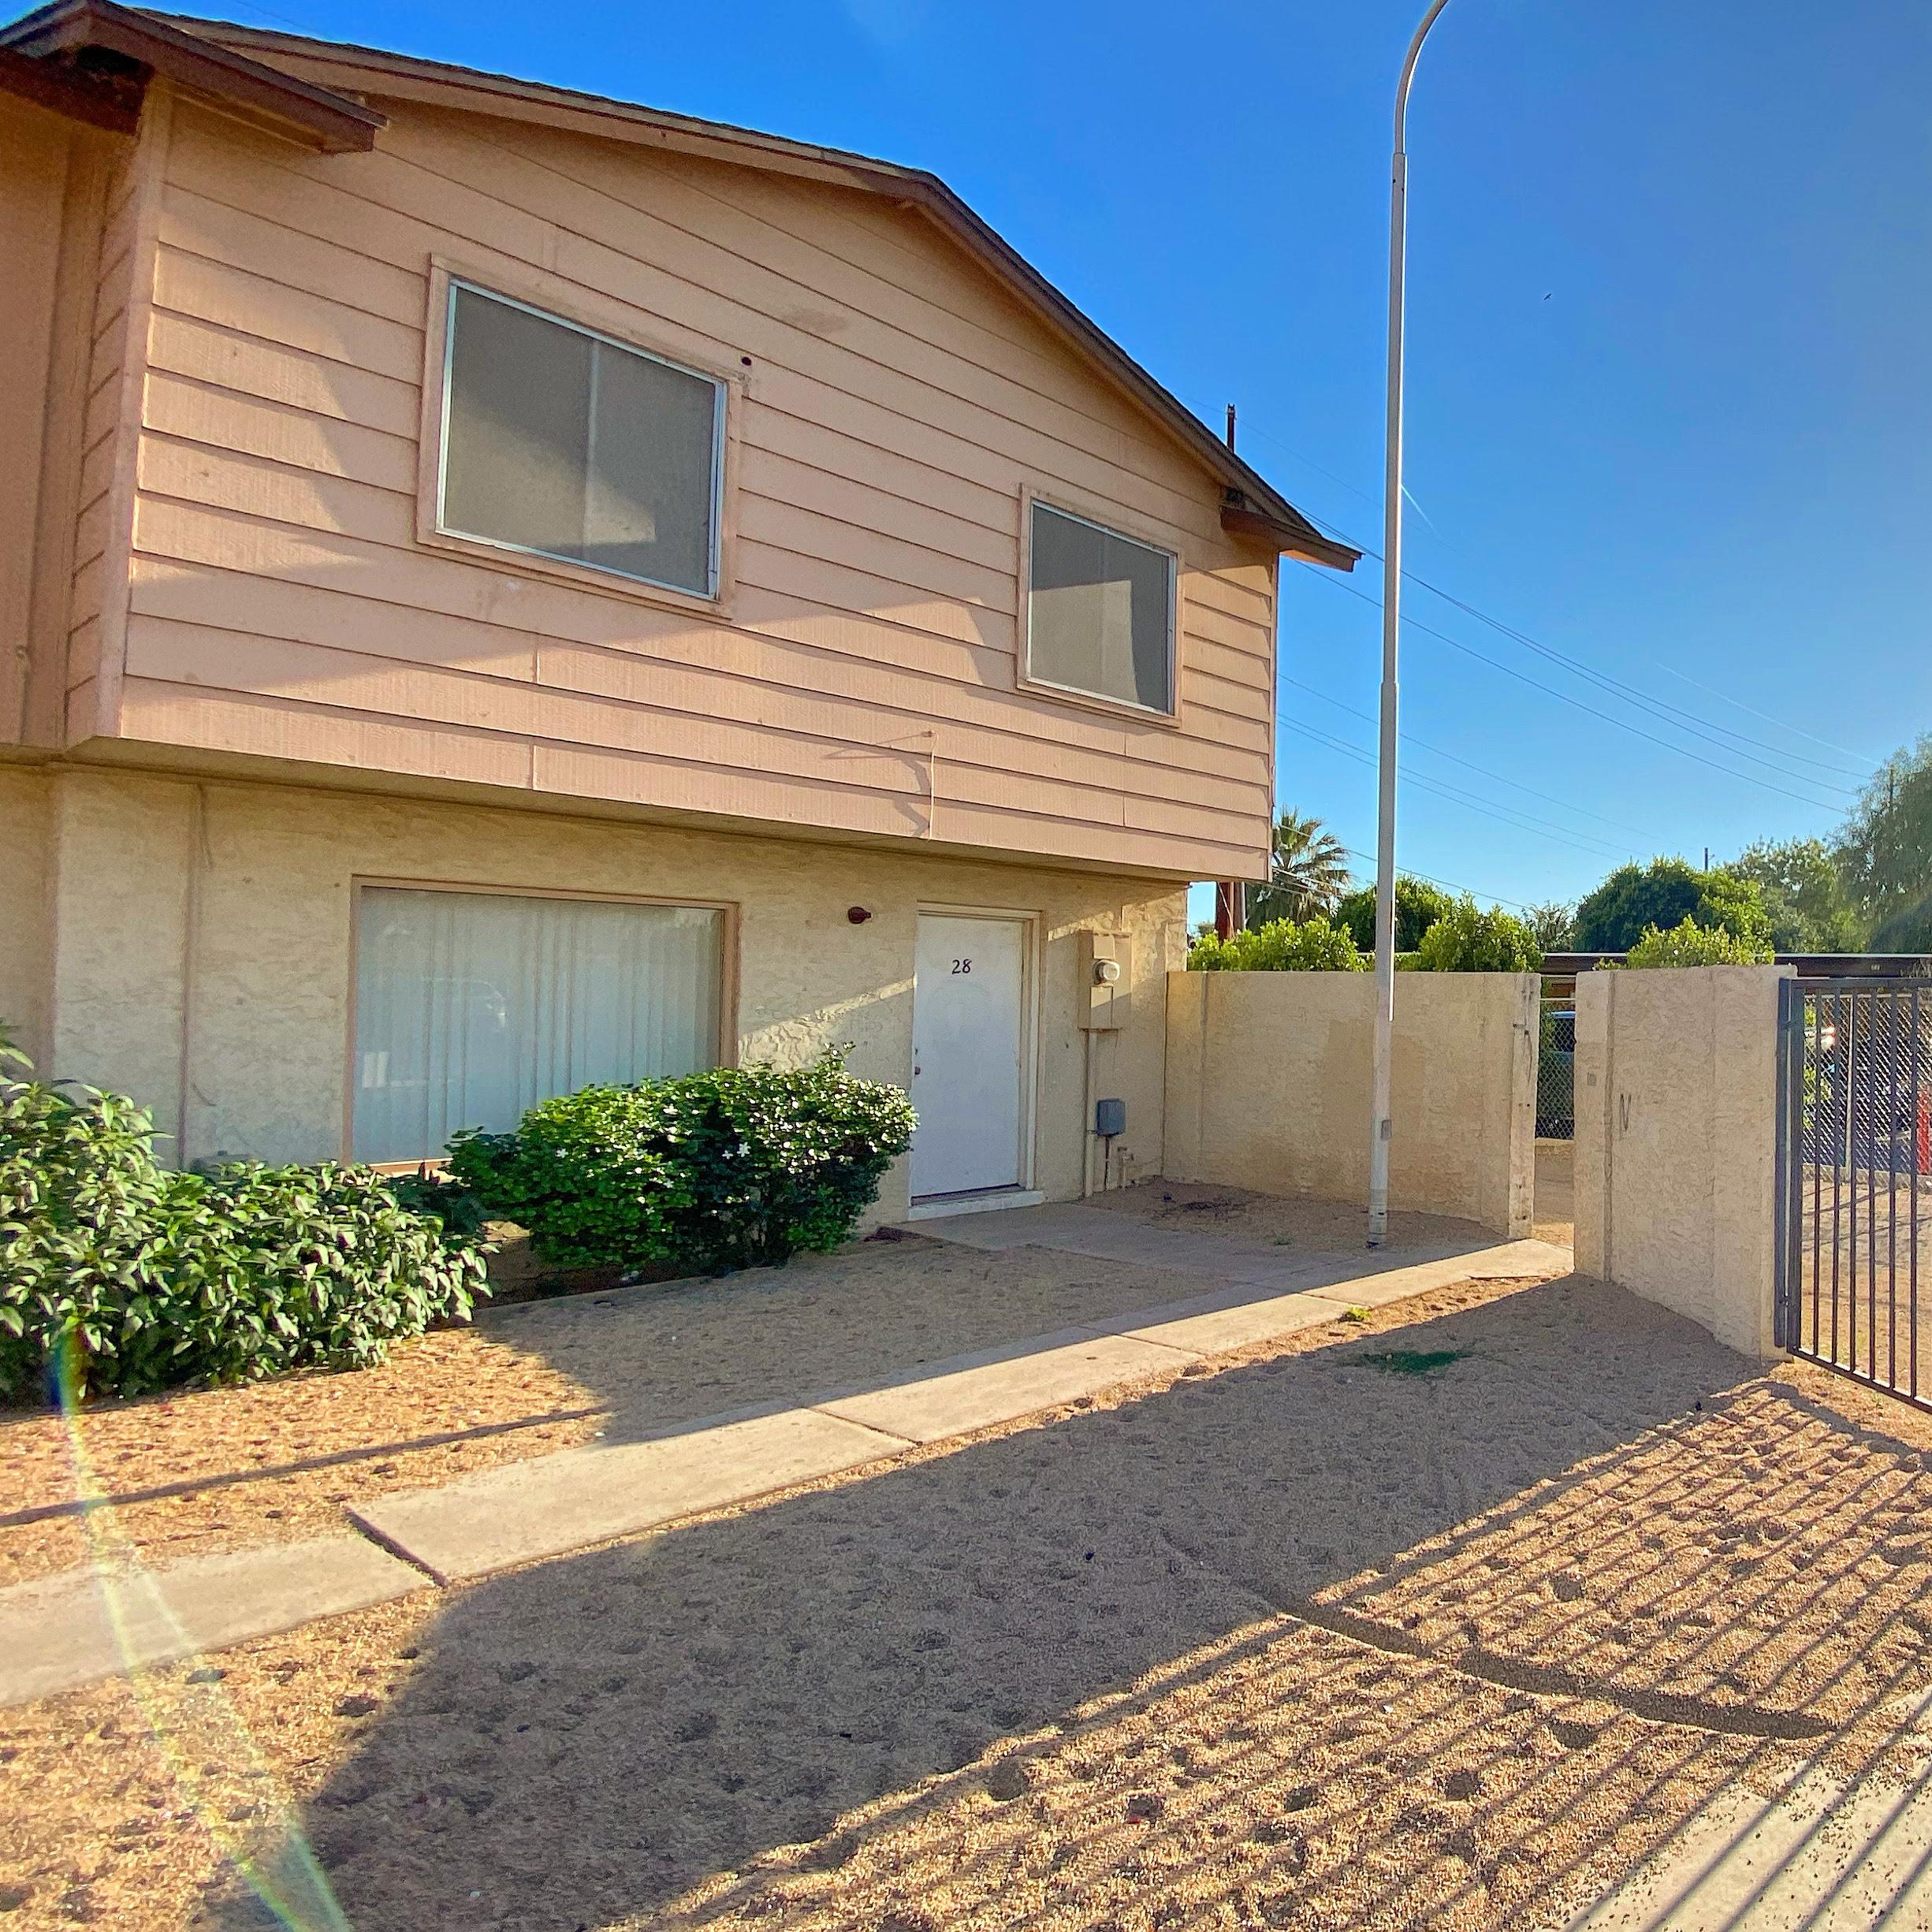 3605 W Bethany Home Rd Apt 28 Phoenix, AZ 85019 wholesale priced condo unit